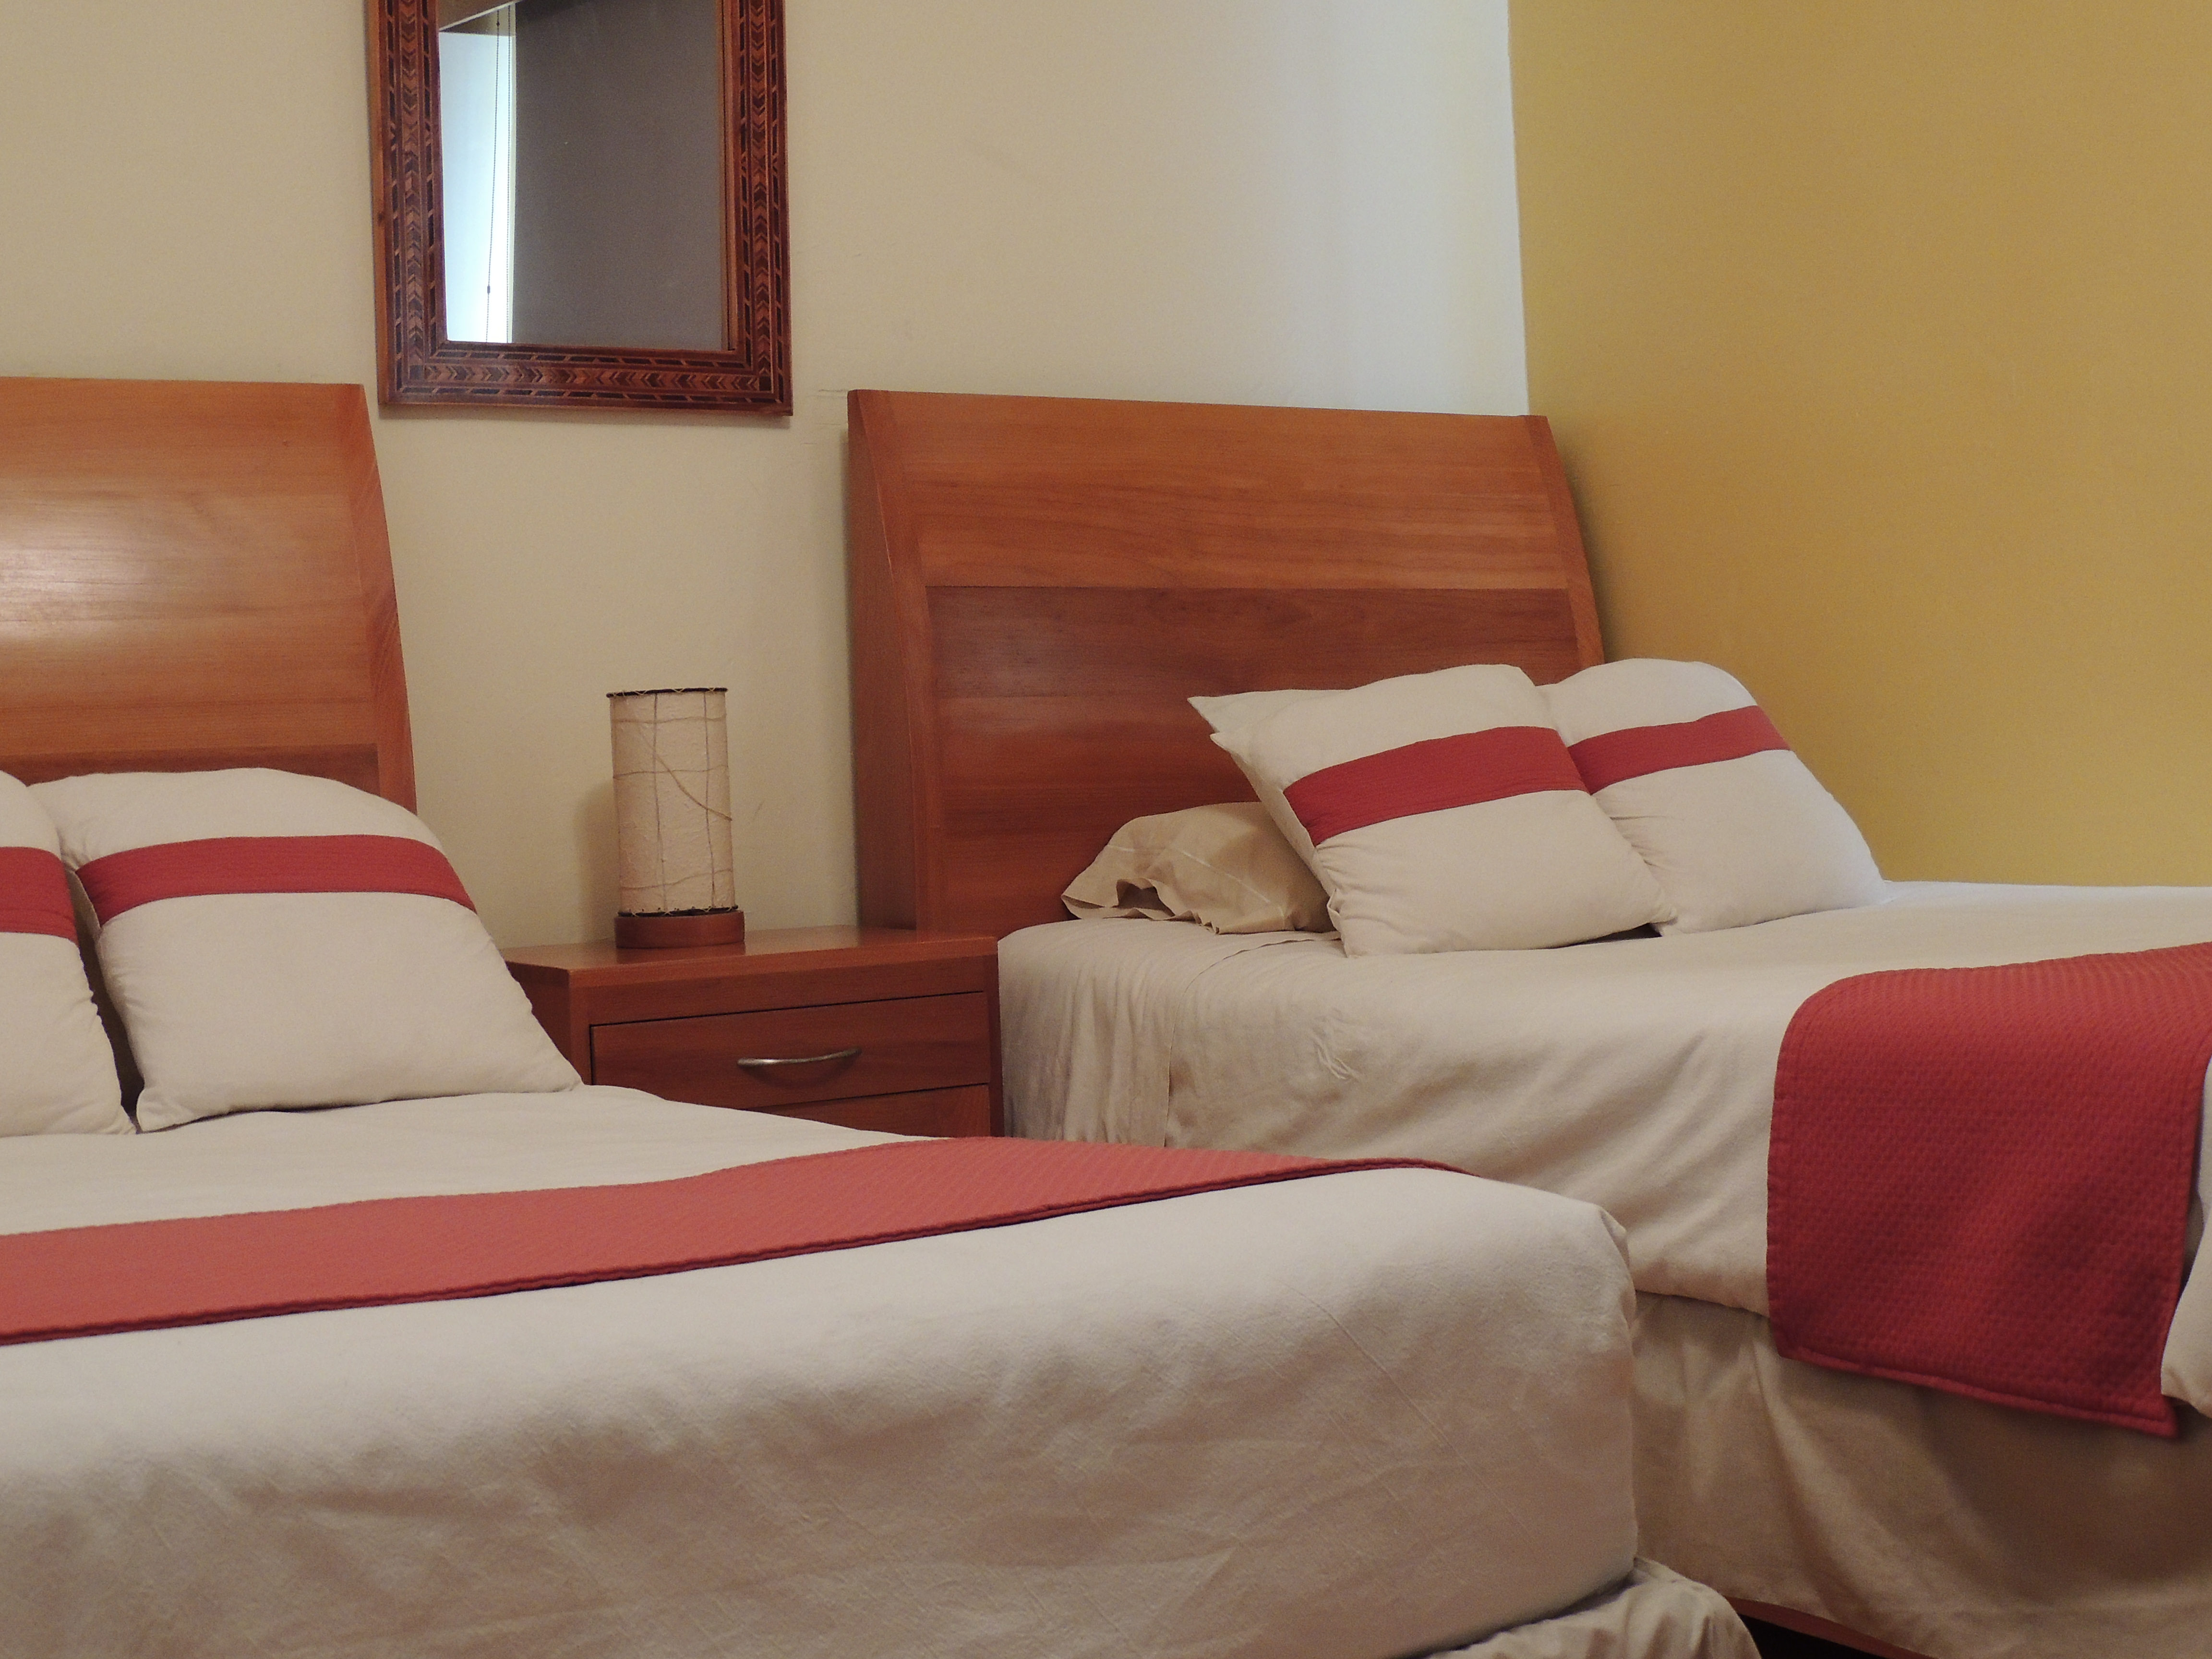 Recámara / Room Polanco